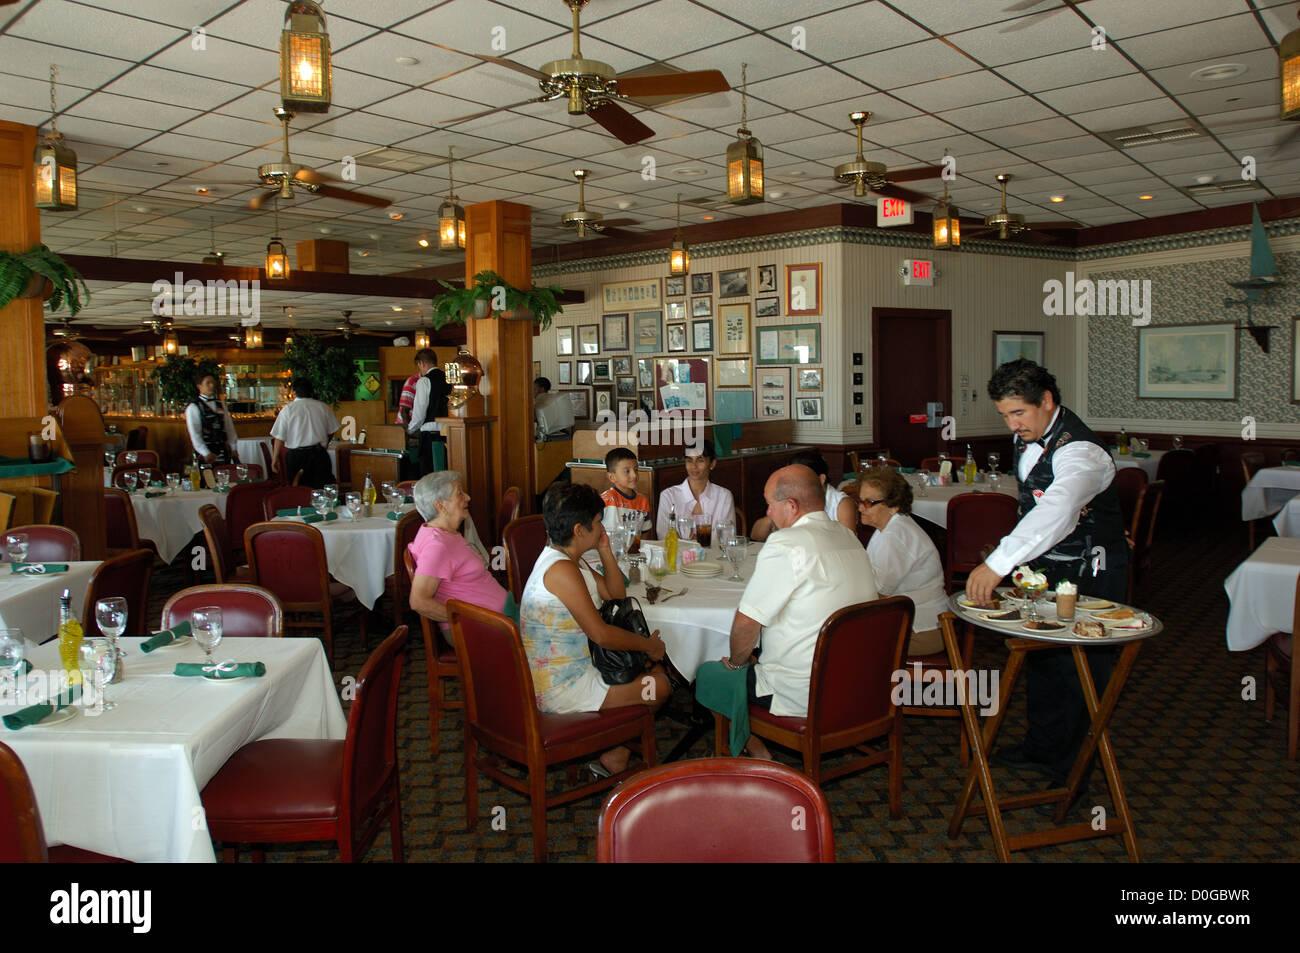 Main Dining Room At Gaido S Seafood Restaurant In Galveston